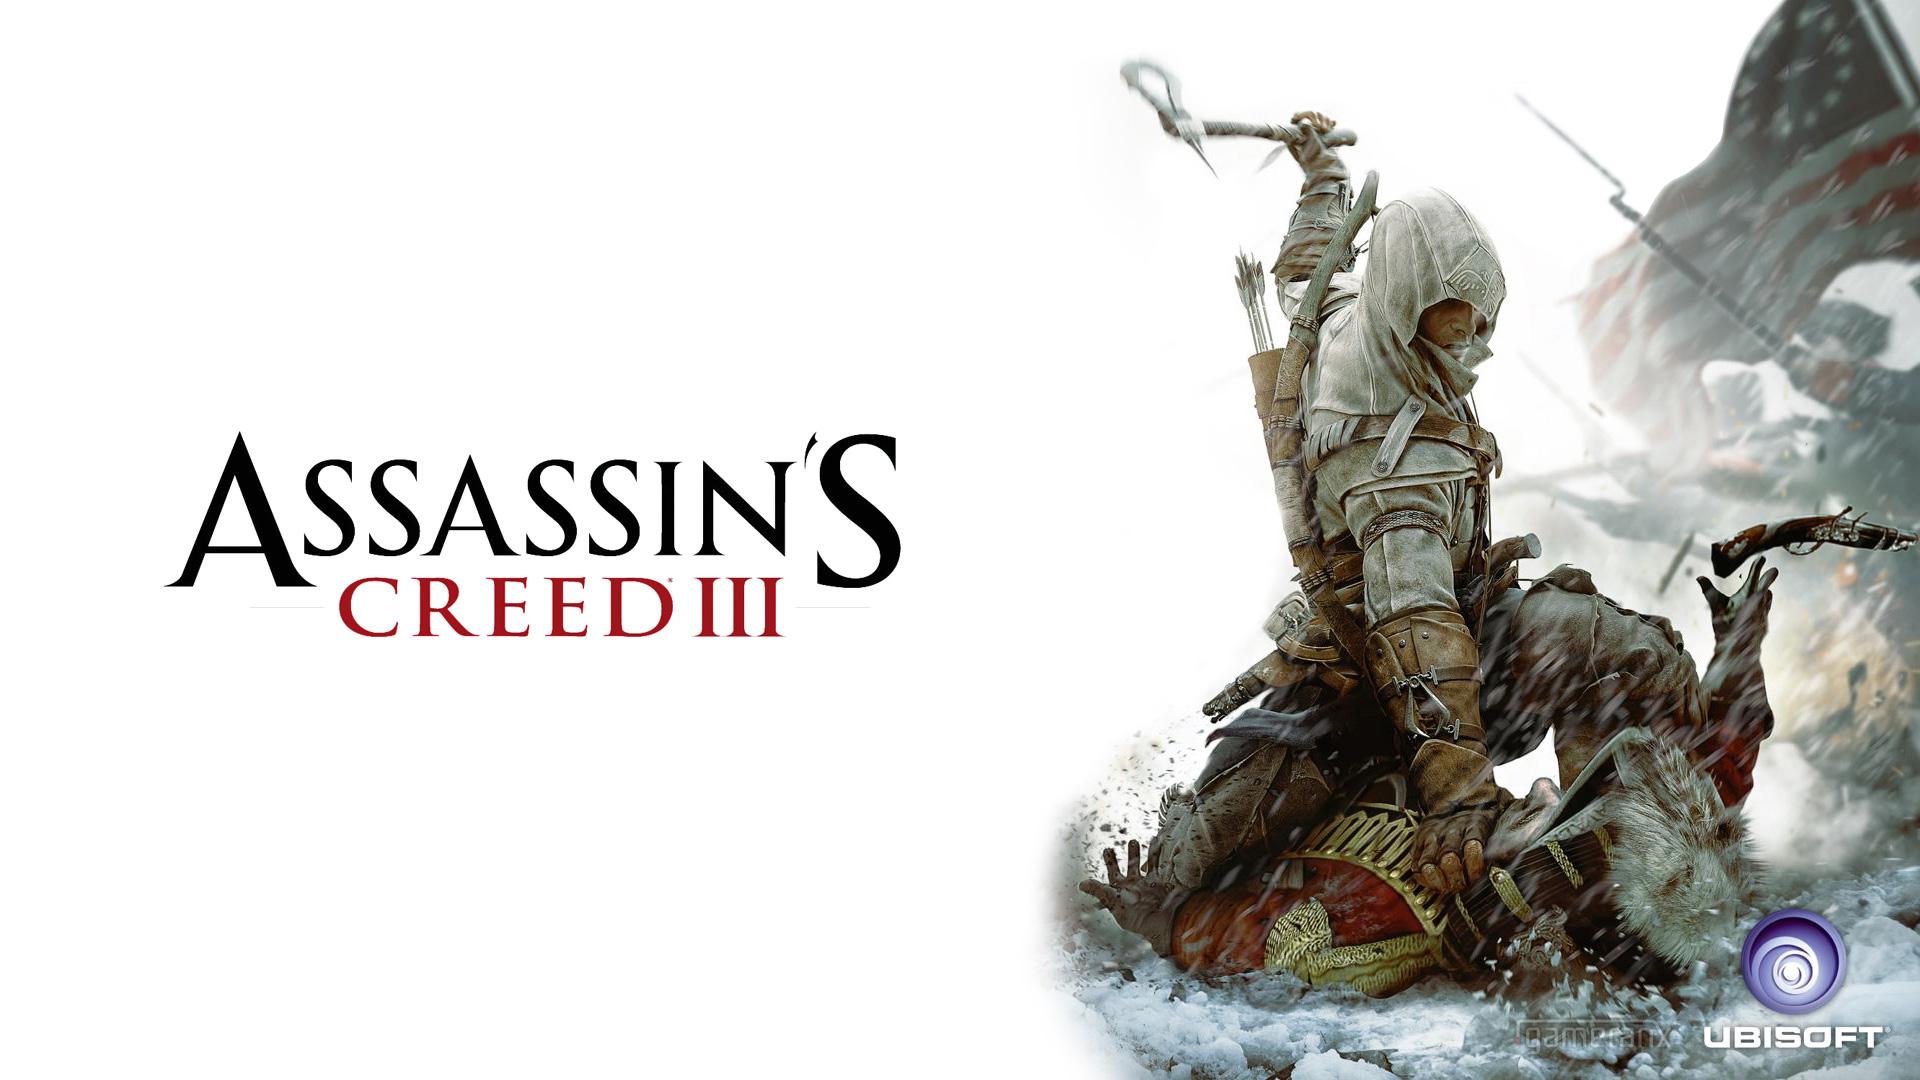 Assassins Creed III HD Wallpapers 1 1920x1080